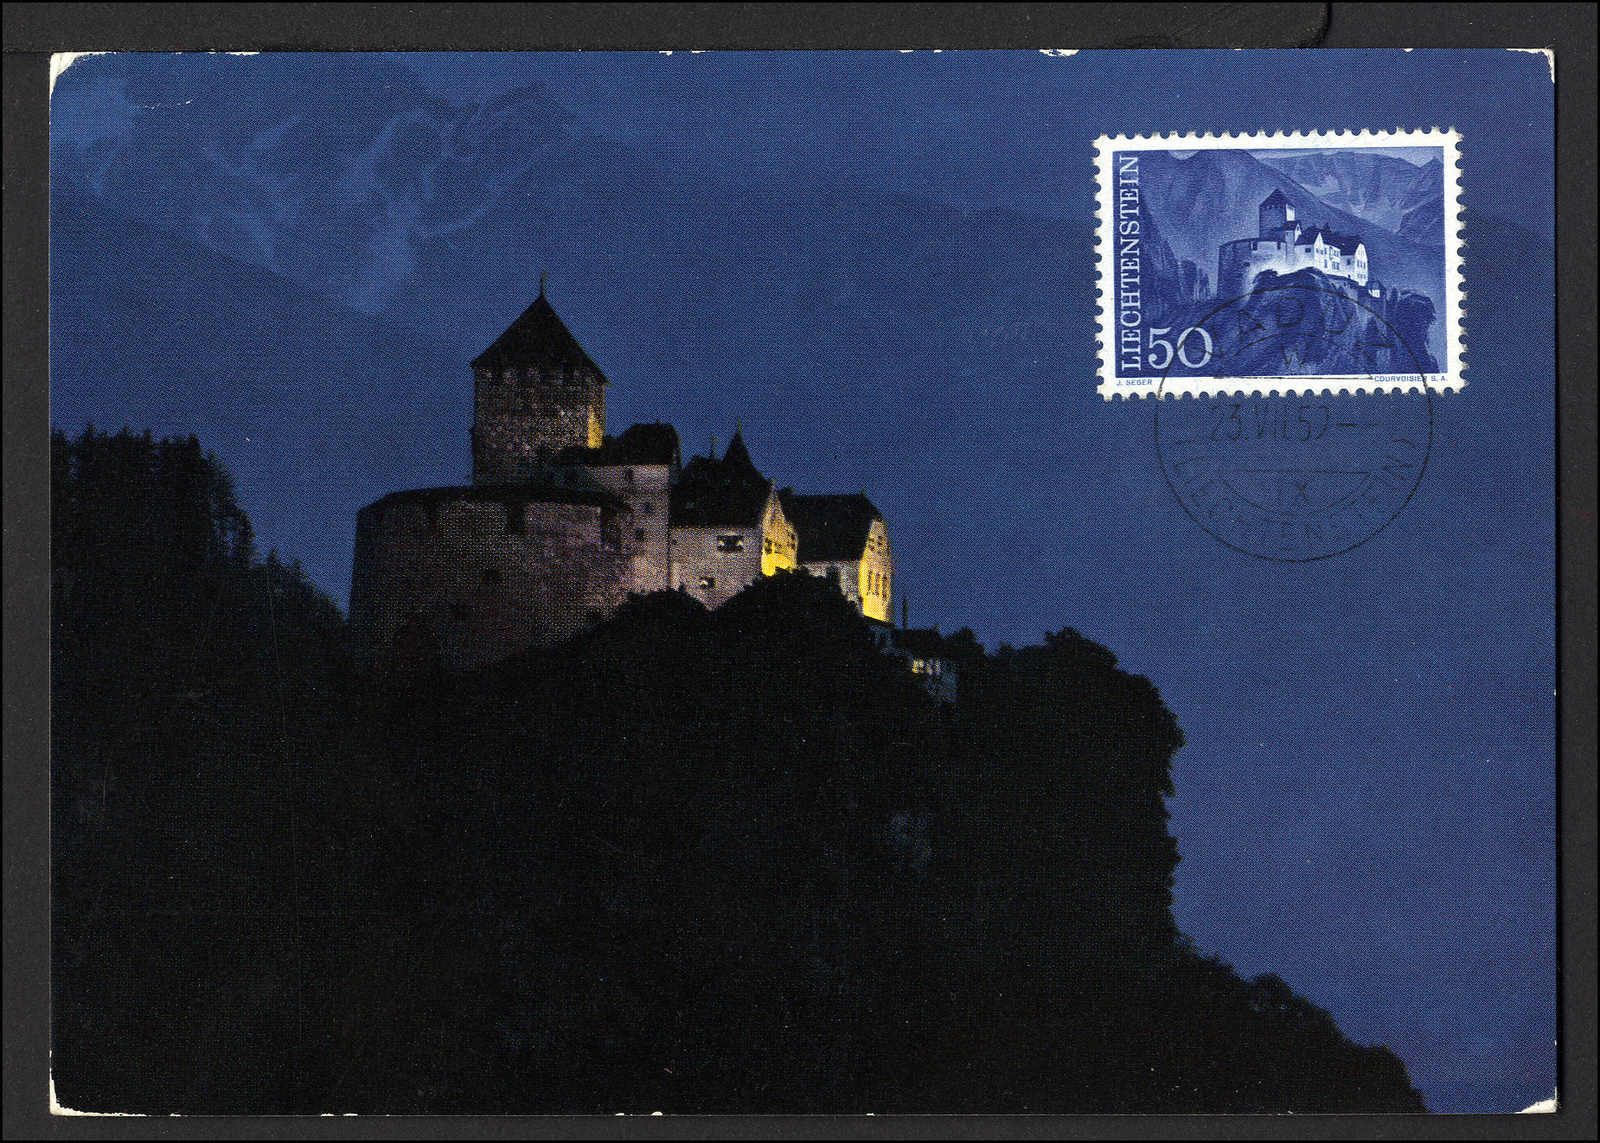 Lot 982 - europa Liechtenstein -  Rolli Auctions Auction #68 Day 1